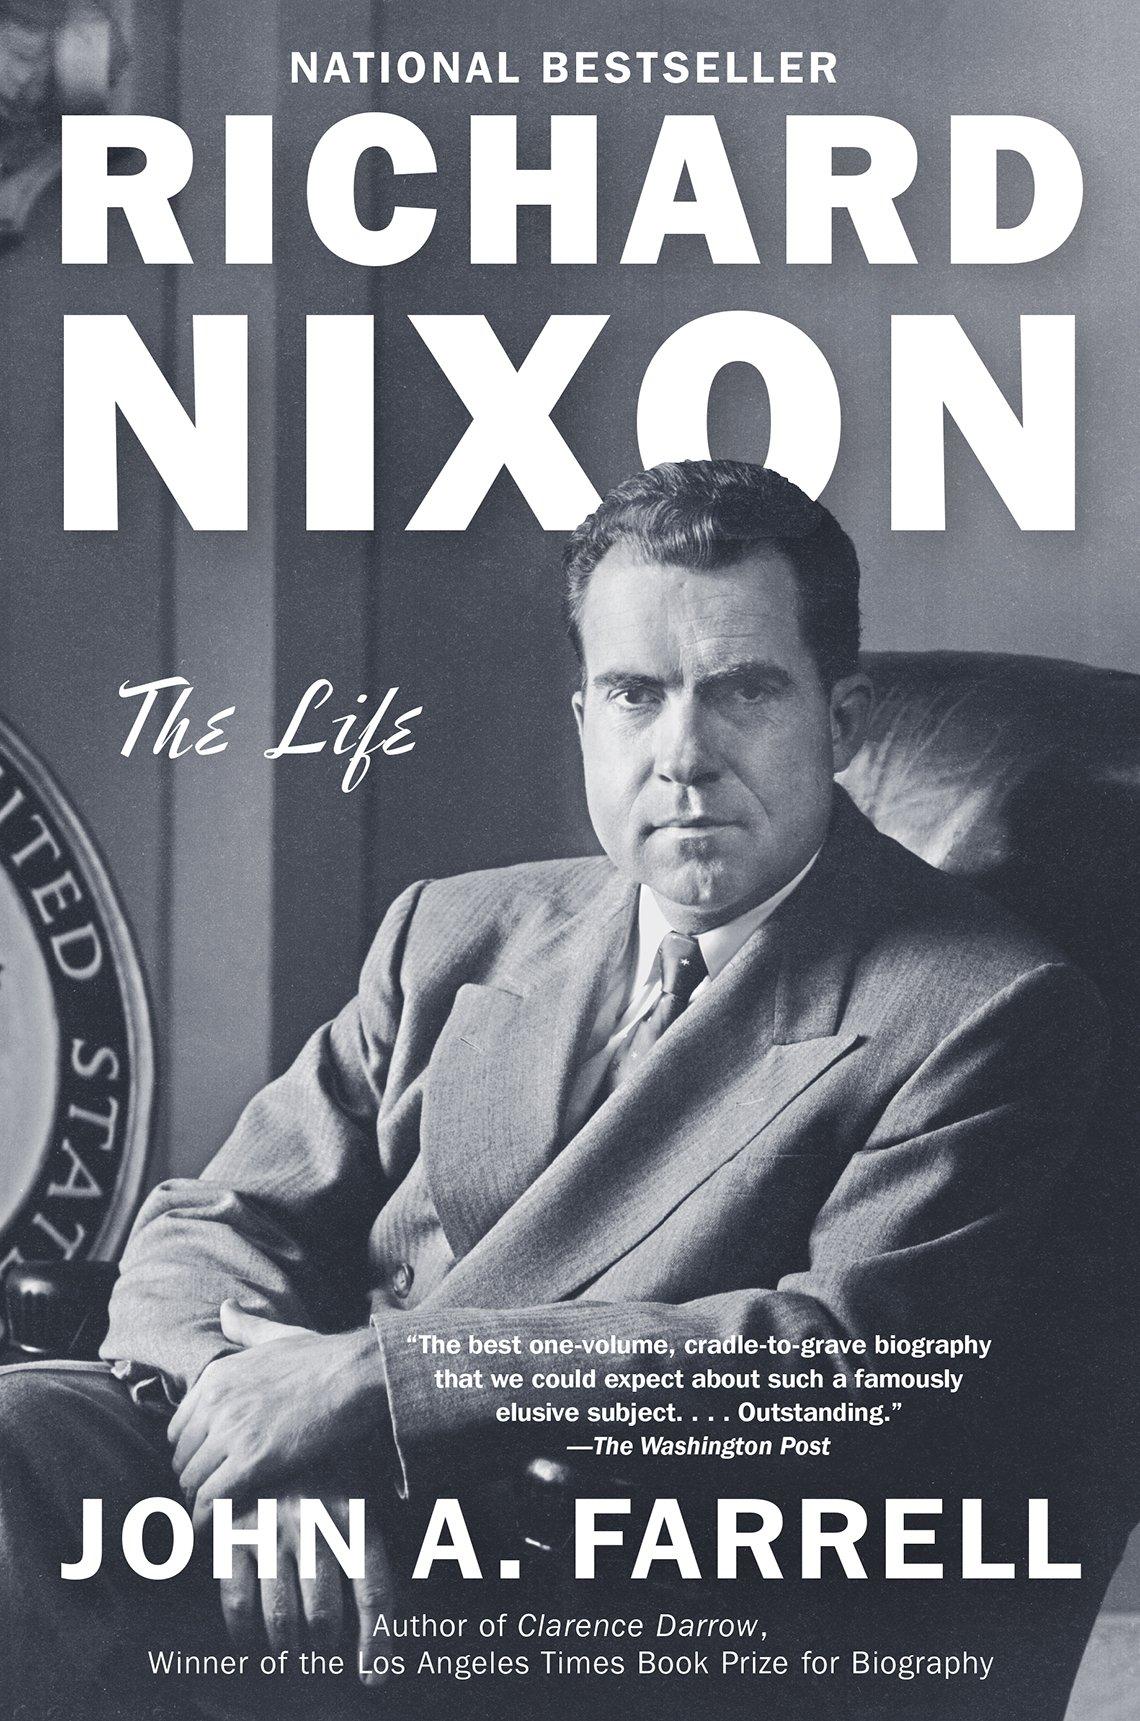 Richard Nixon, The Life, por John A. Farrell.